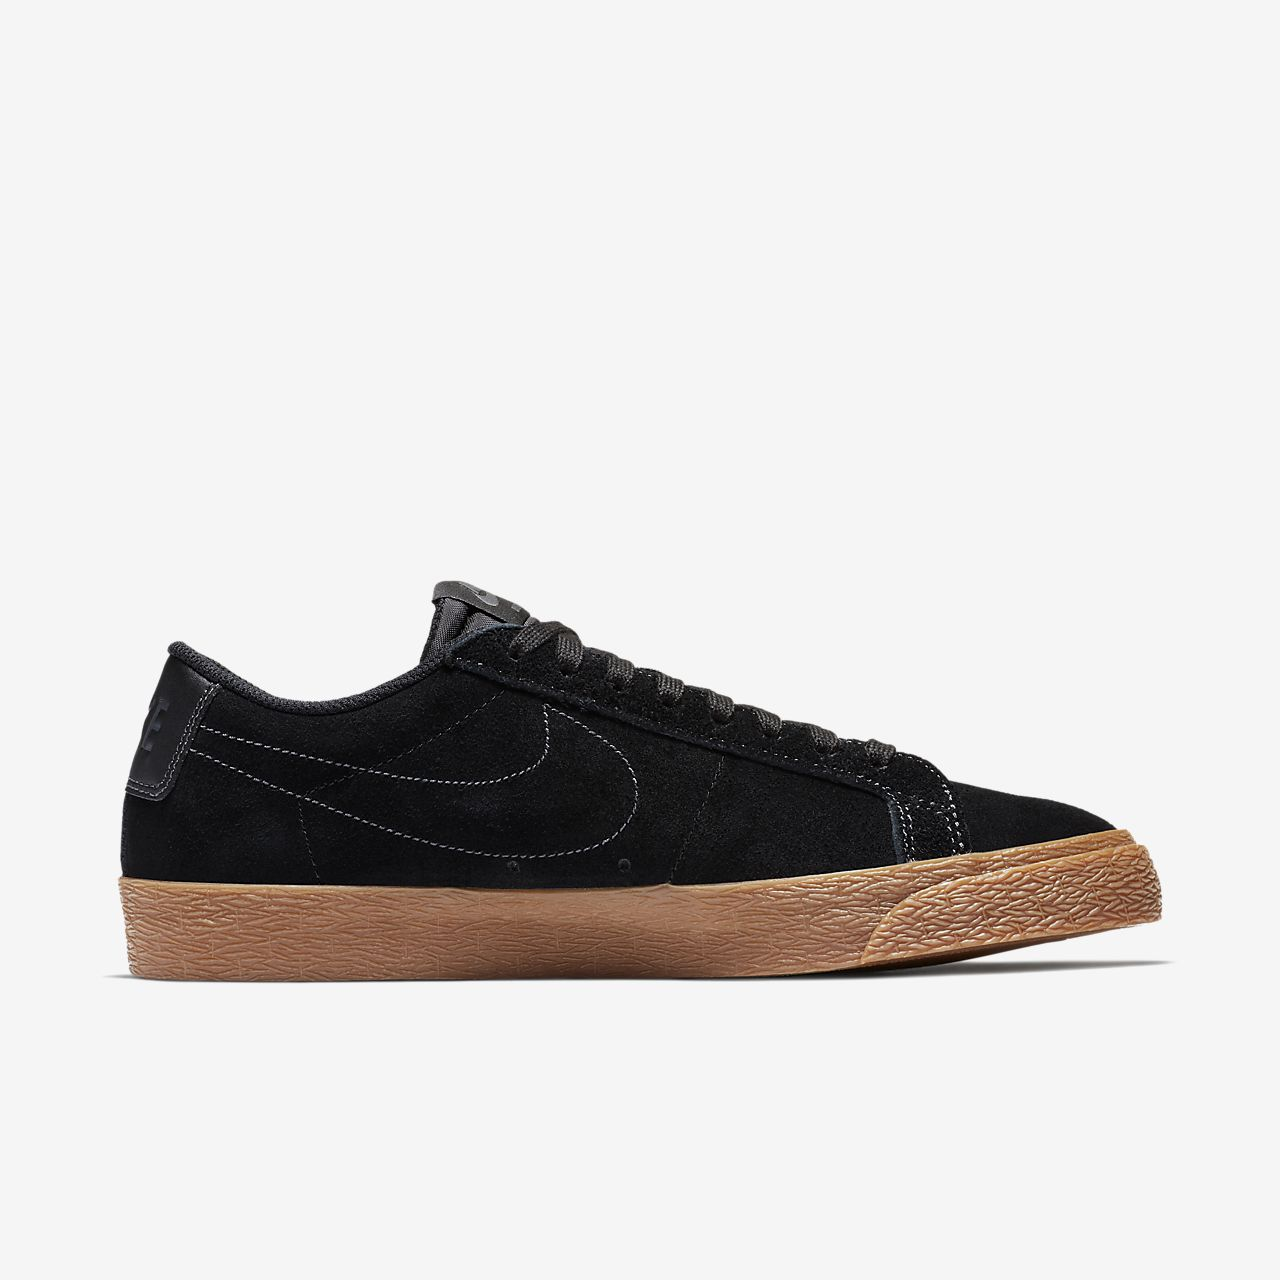 ... Nike SB Blazer Low Men's Skateboarding Shoe